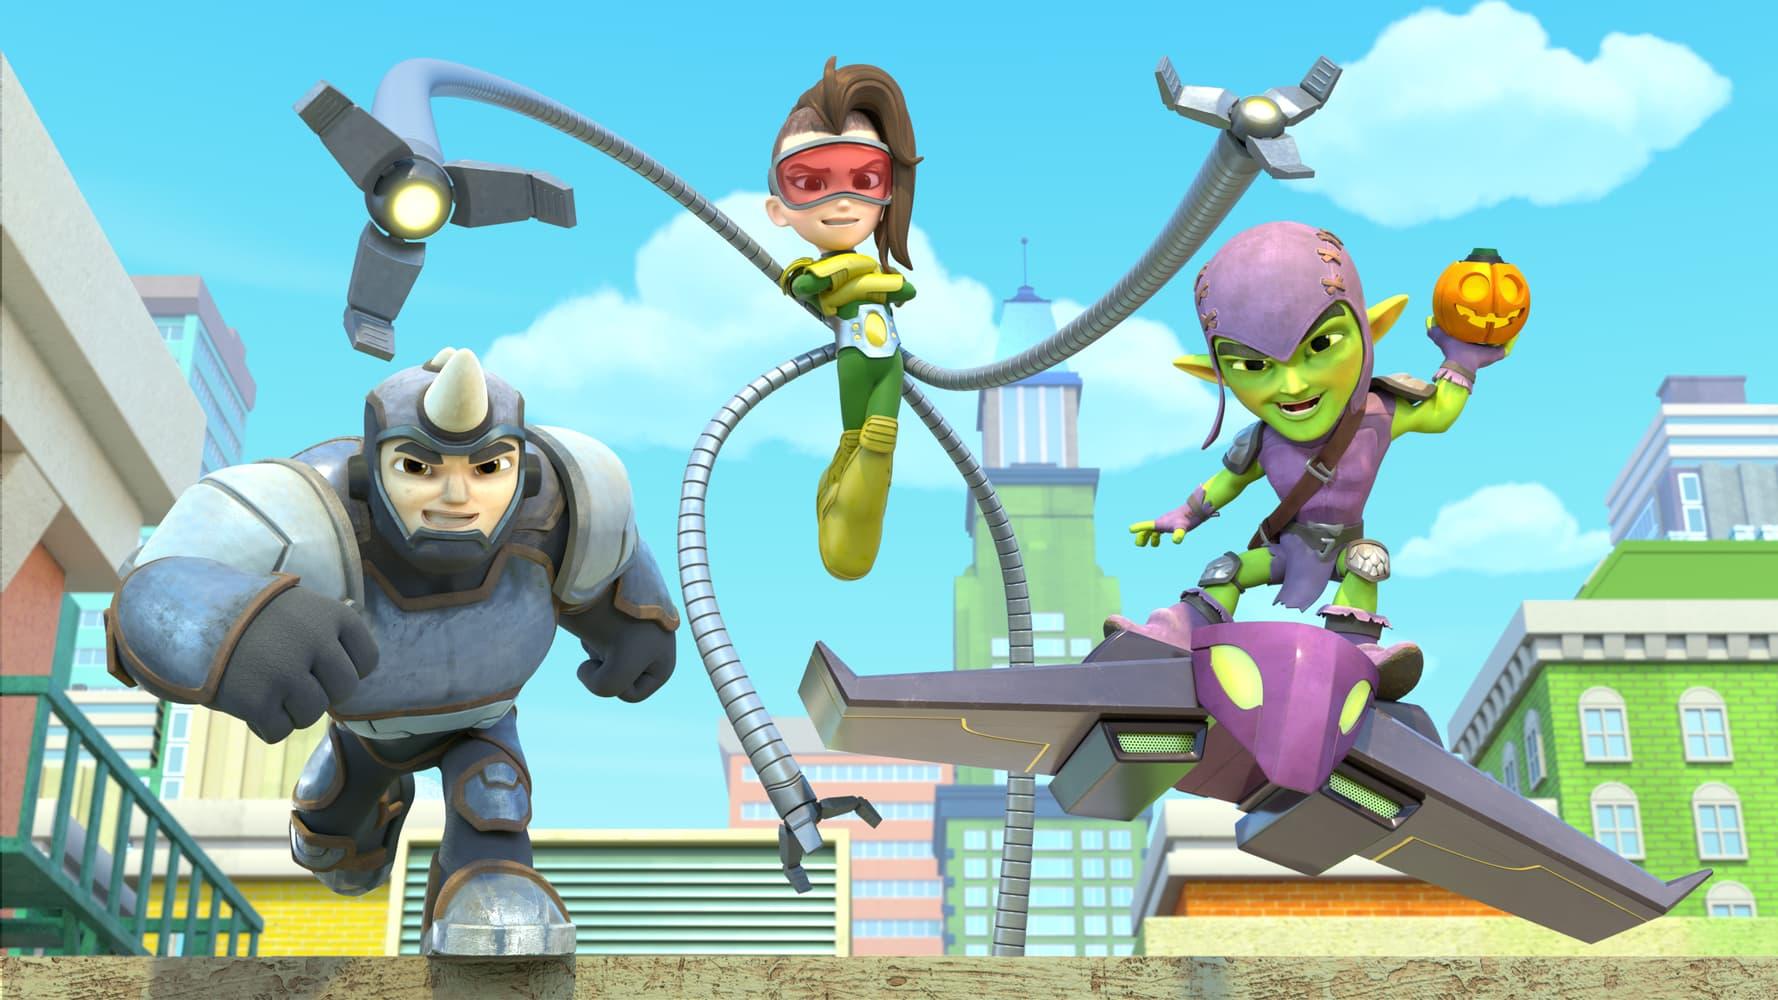 Rhino, Doc Ock, Green Goblin   Marvel's Spidey and his Amazing Friends